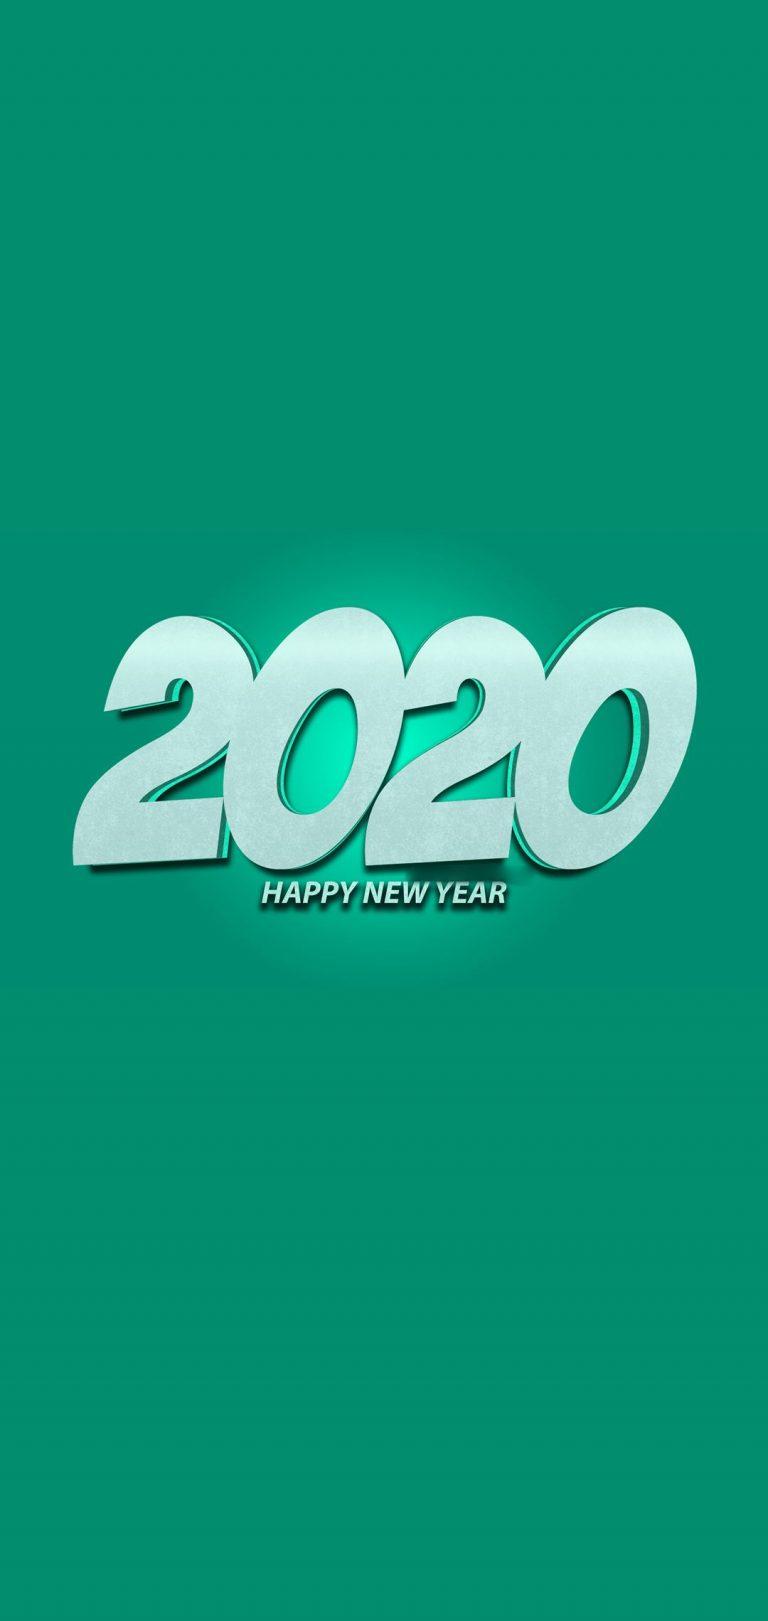 Happy New Year 2020 Phone Wallpaper 10 - [1080x2280]